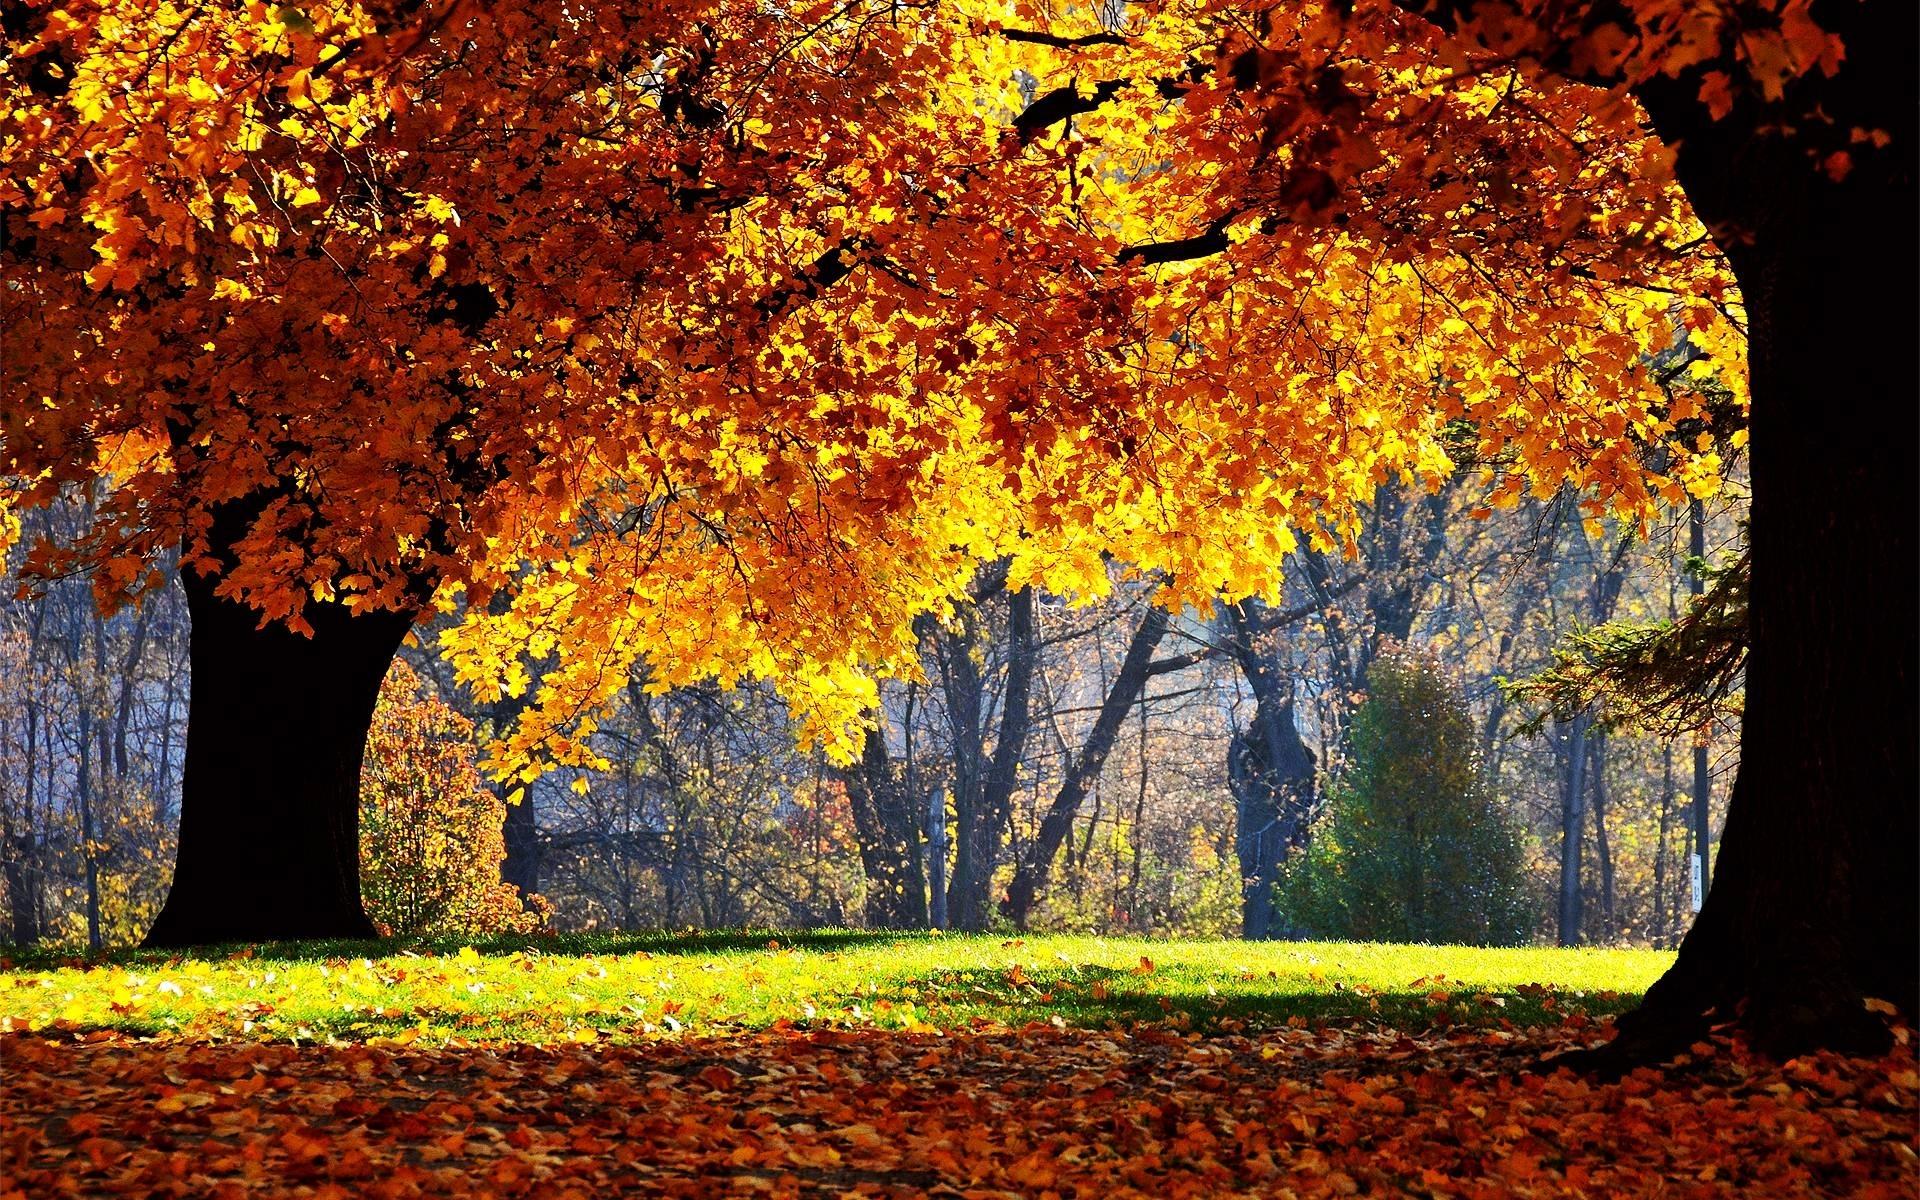 free autumn desktop wallpaper backgrounds - wallpaper cave